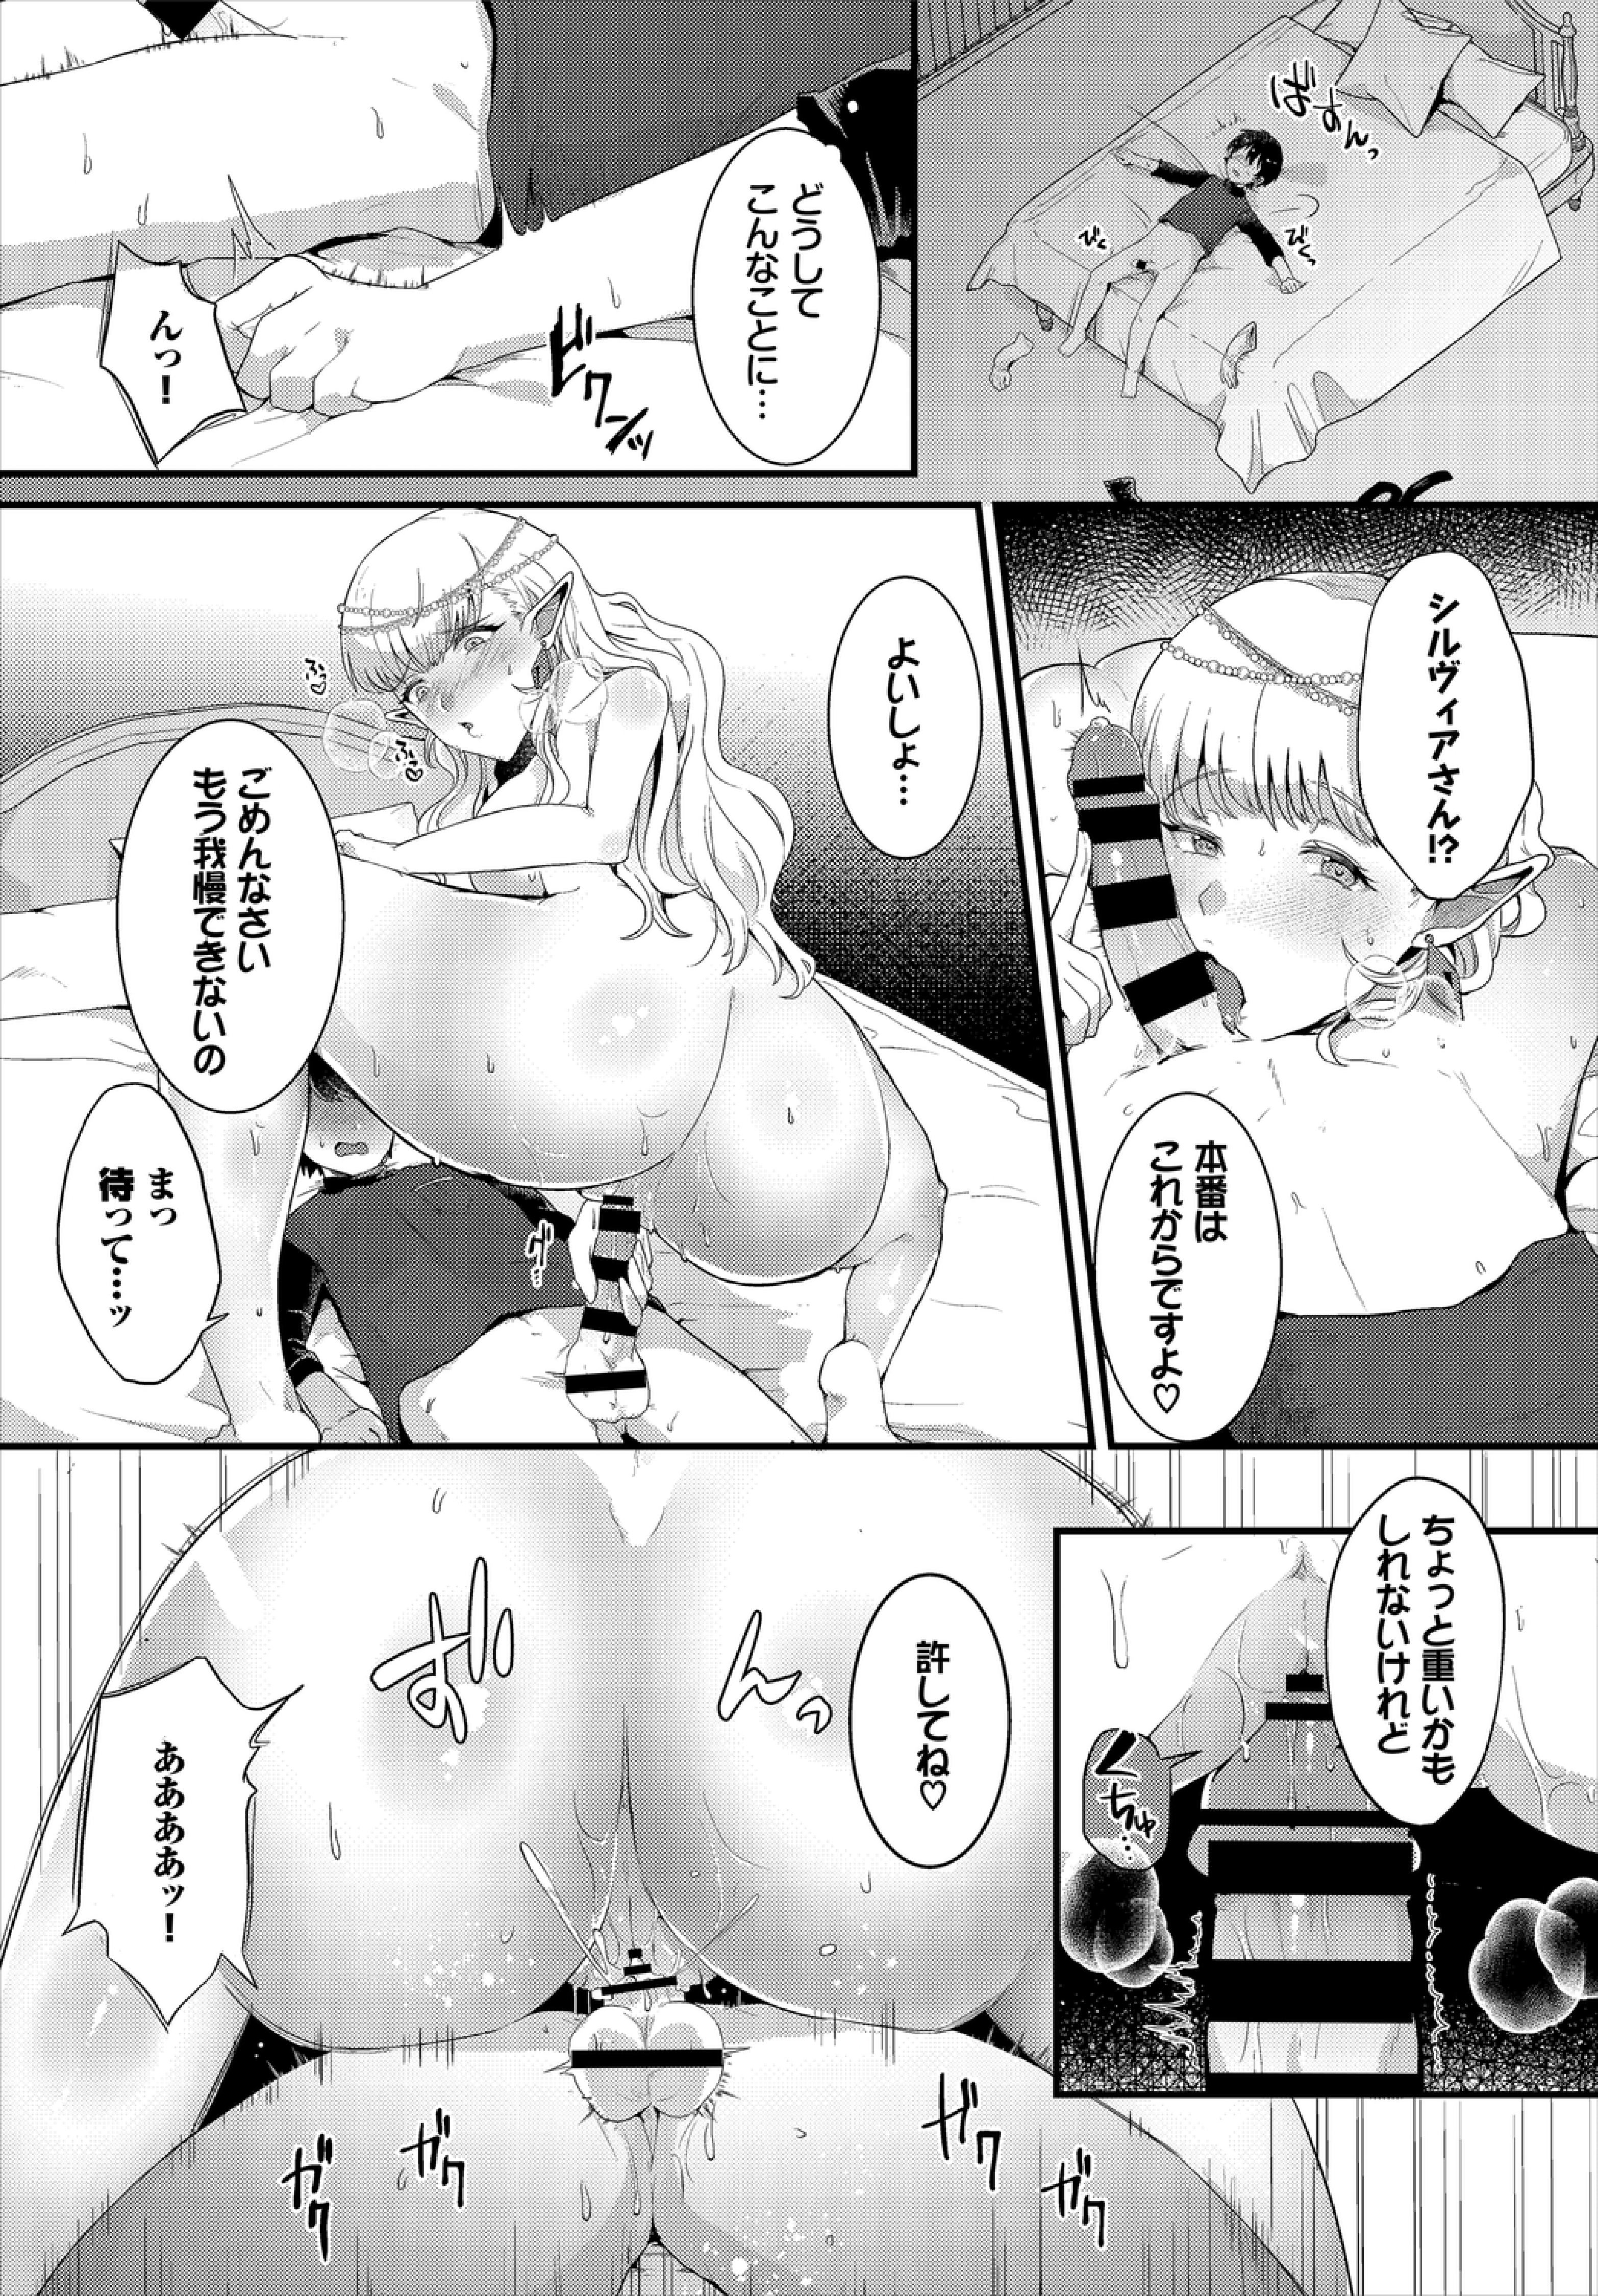 055 12 jpg Page 55